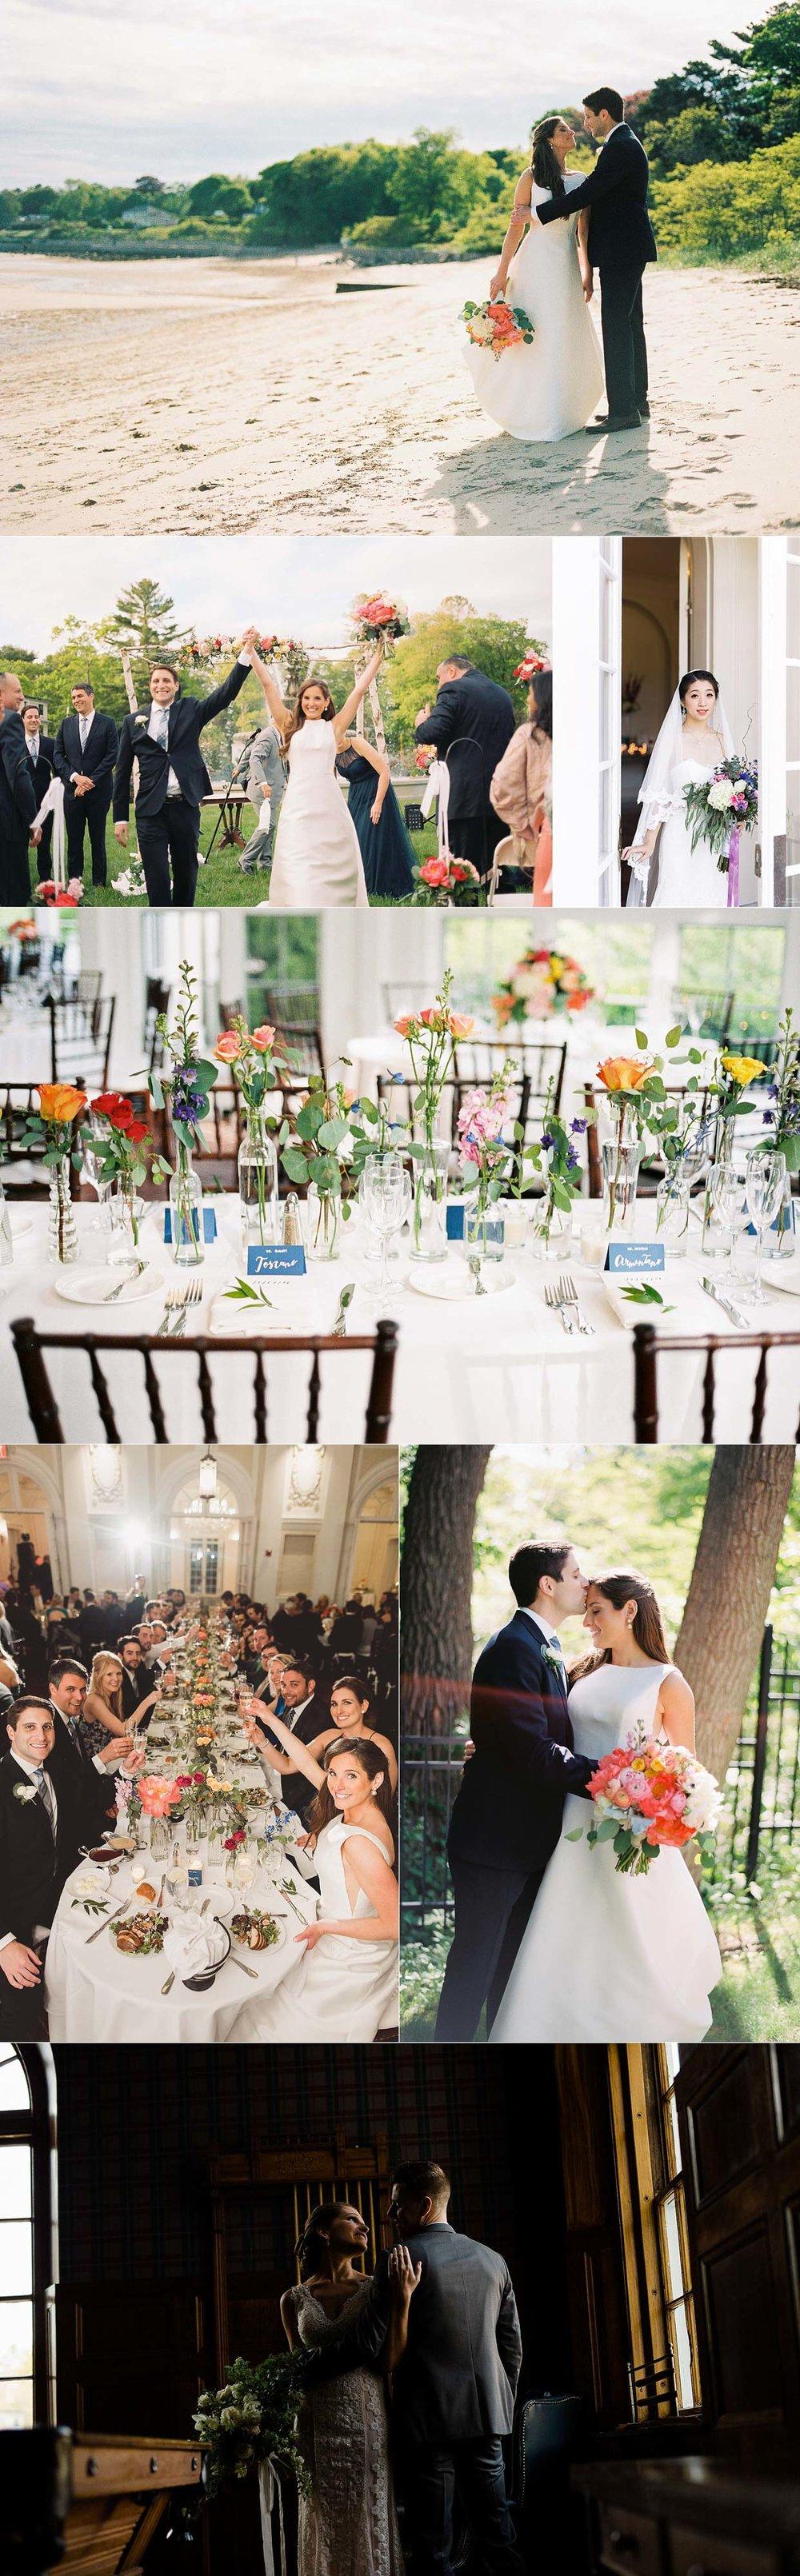 Tupper Manor Wedding - Ebersole Photography-1-2.jpg